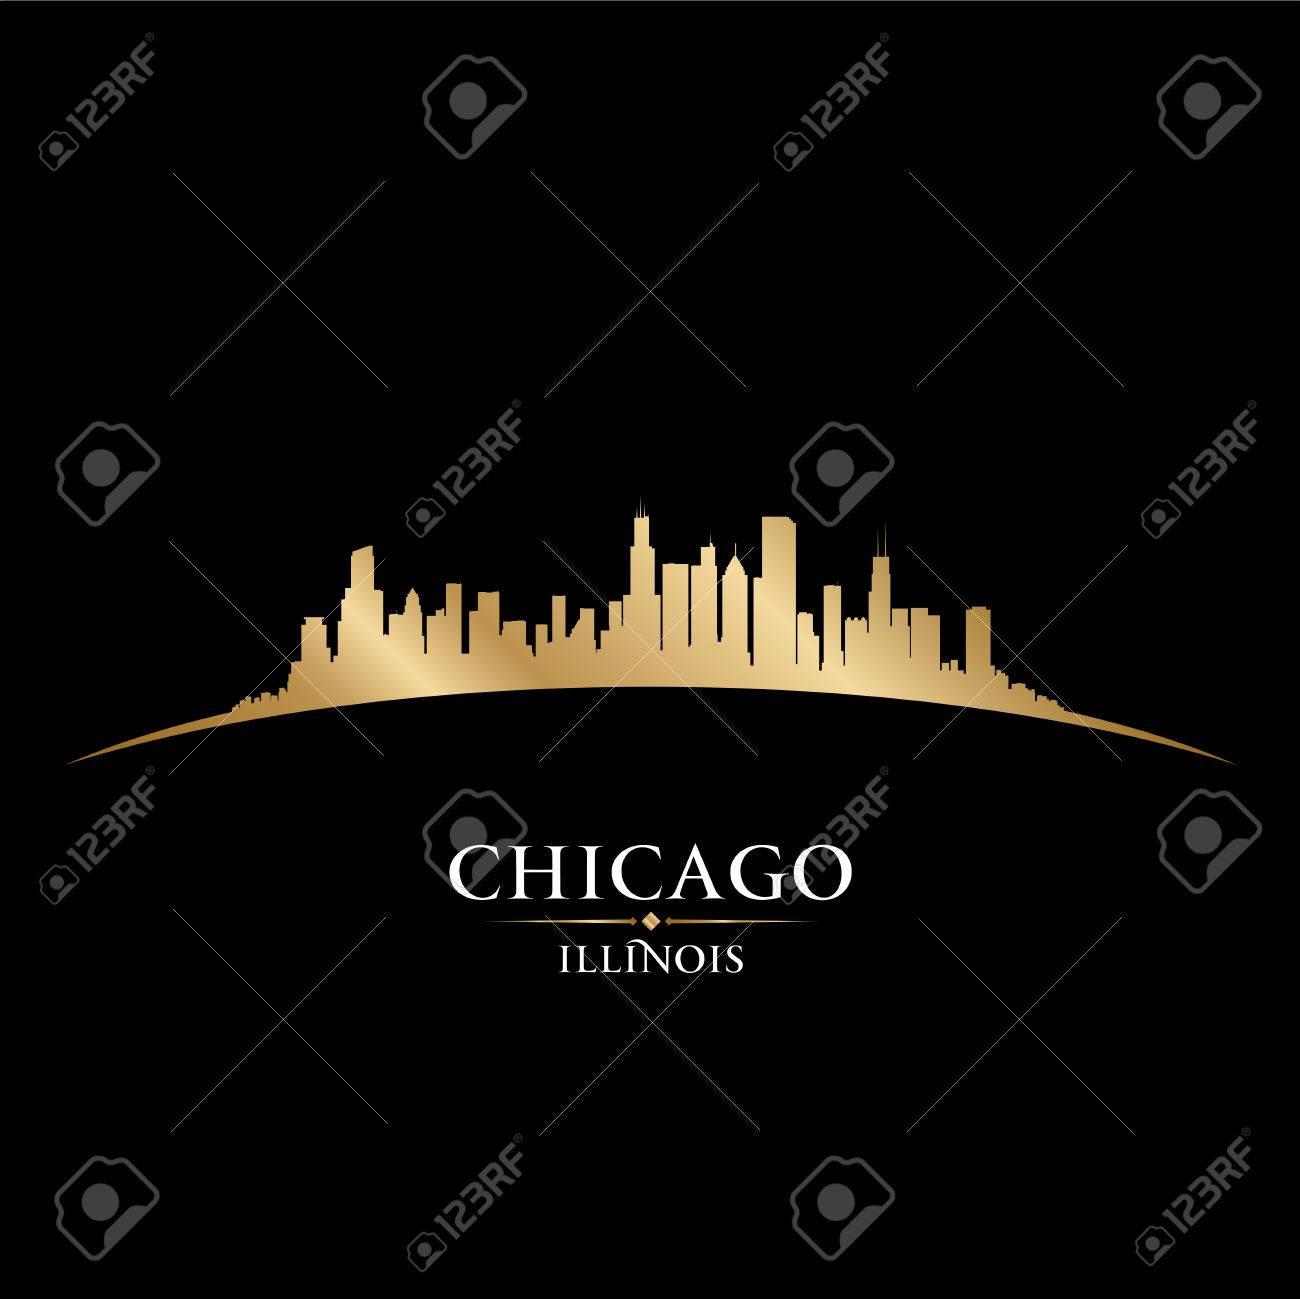 Chicago Illinois city skyline silhouette. Vector illustration Stock Vector - 22598675